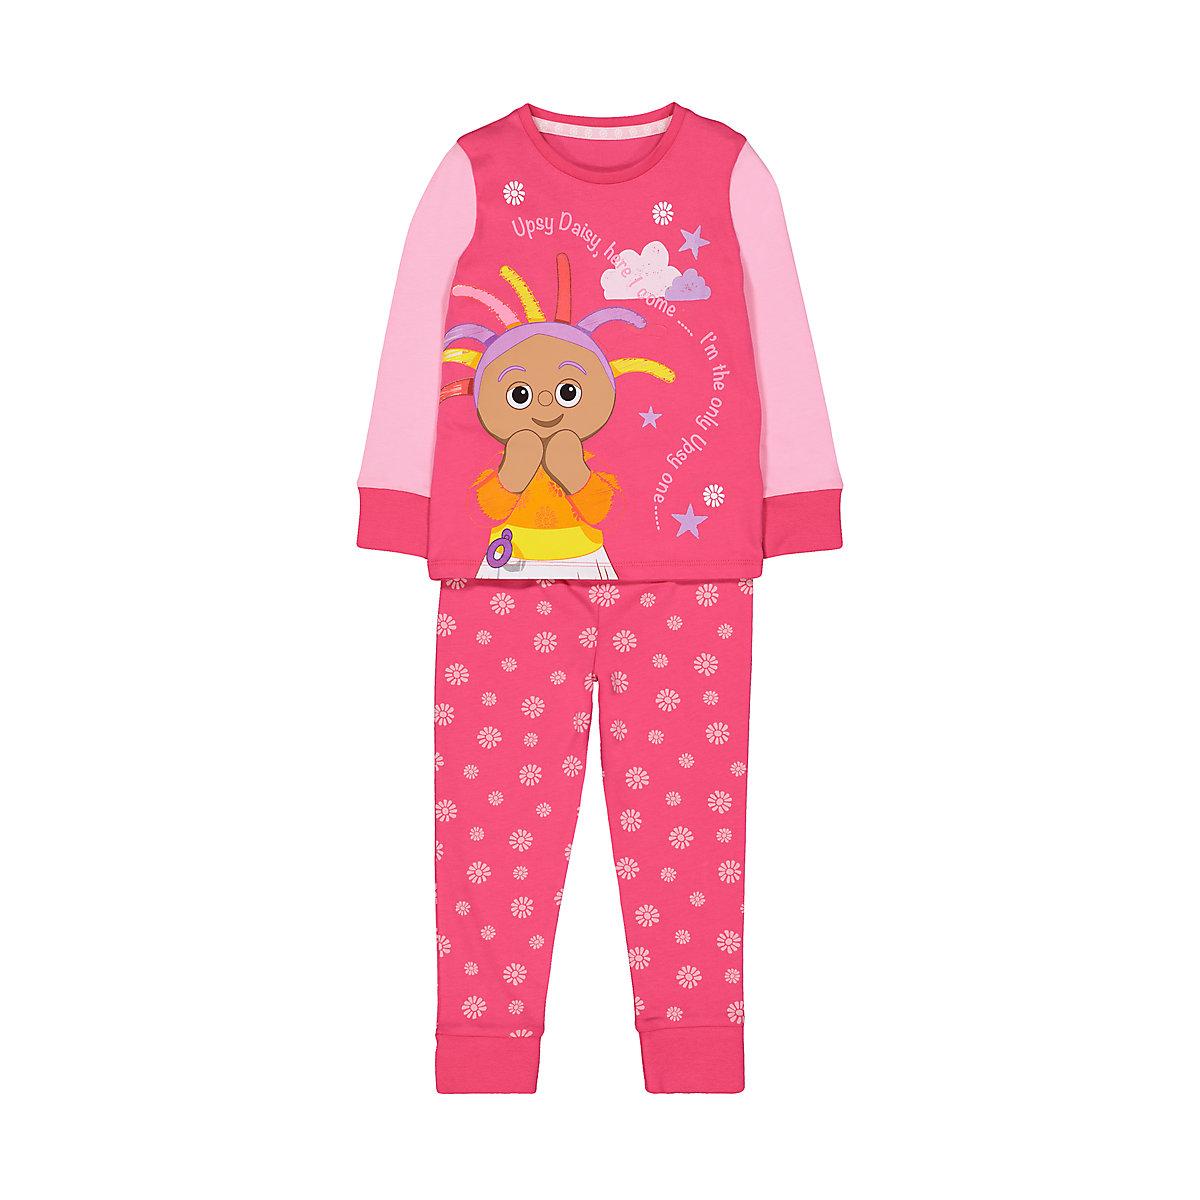 pink in the night garden pyjamas